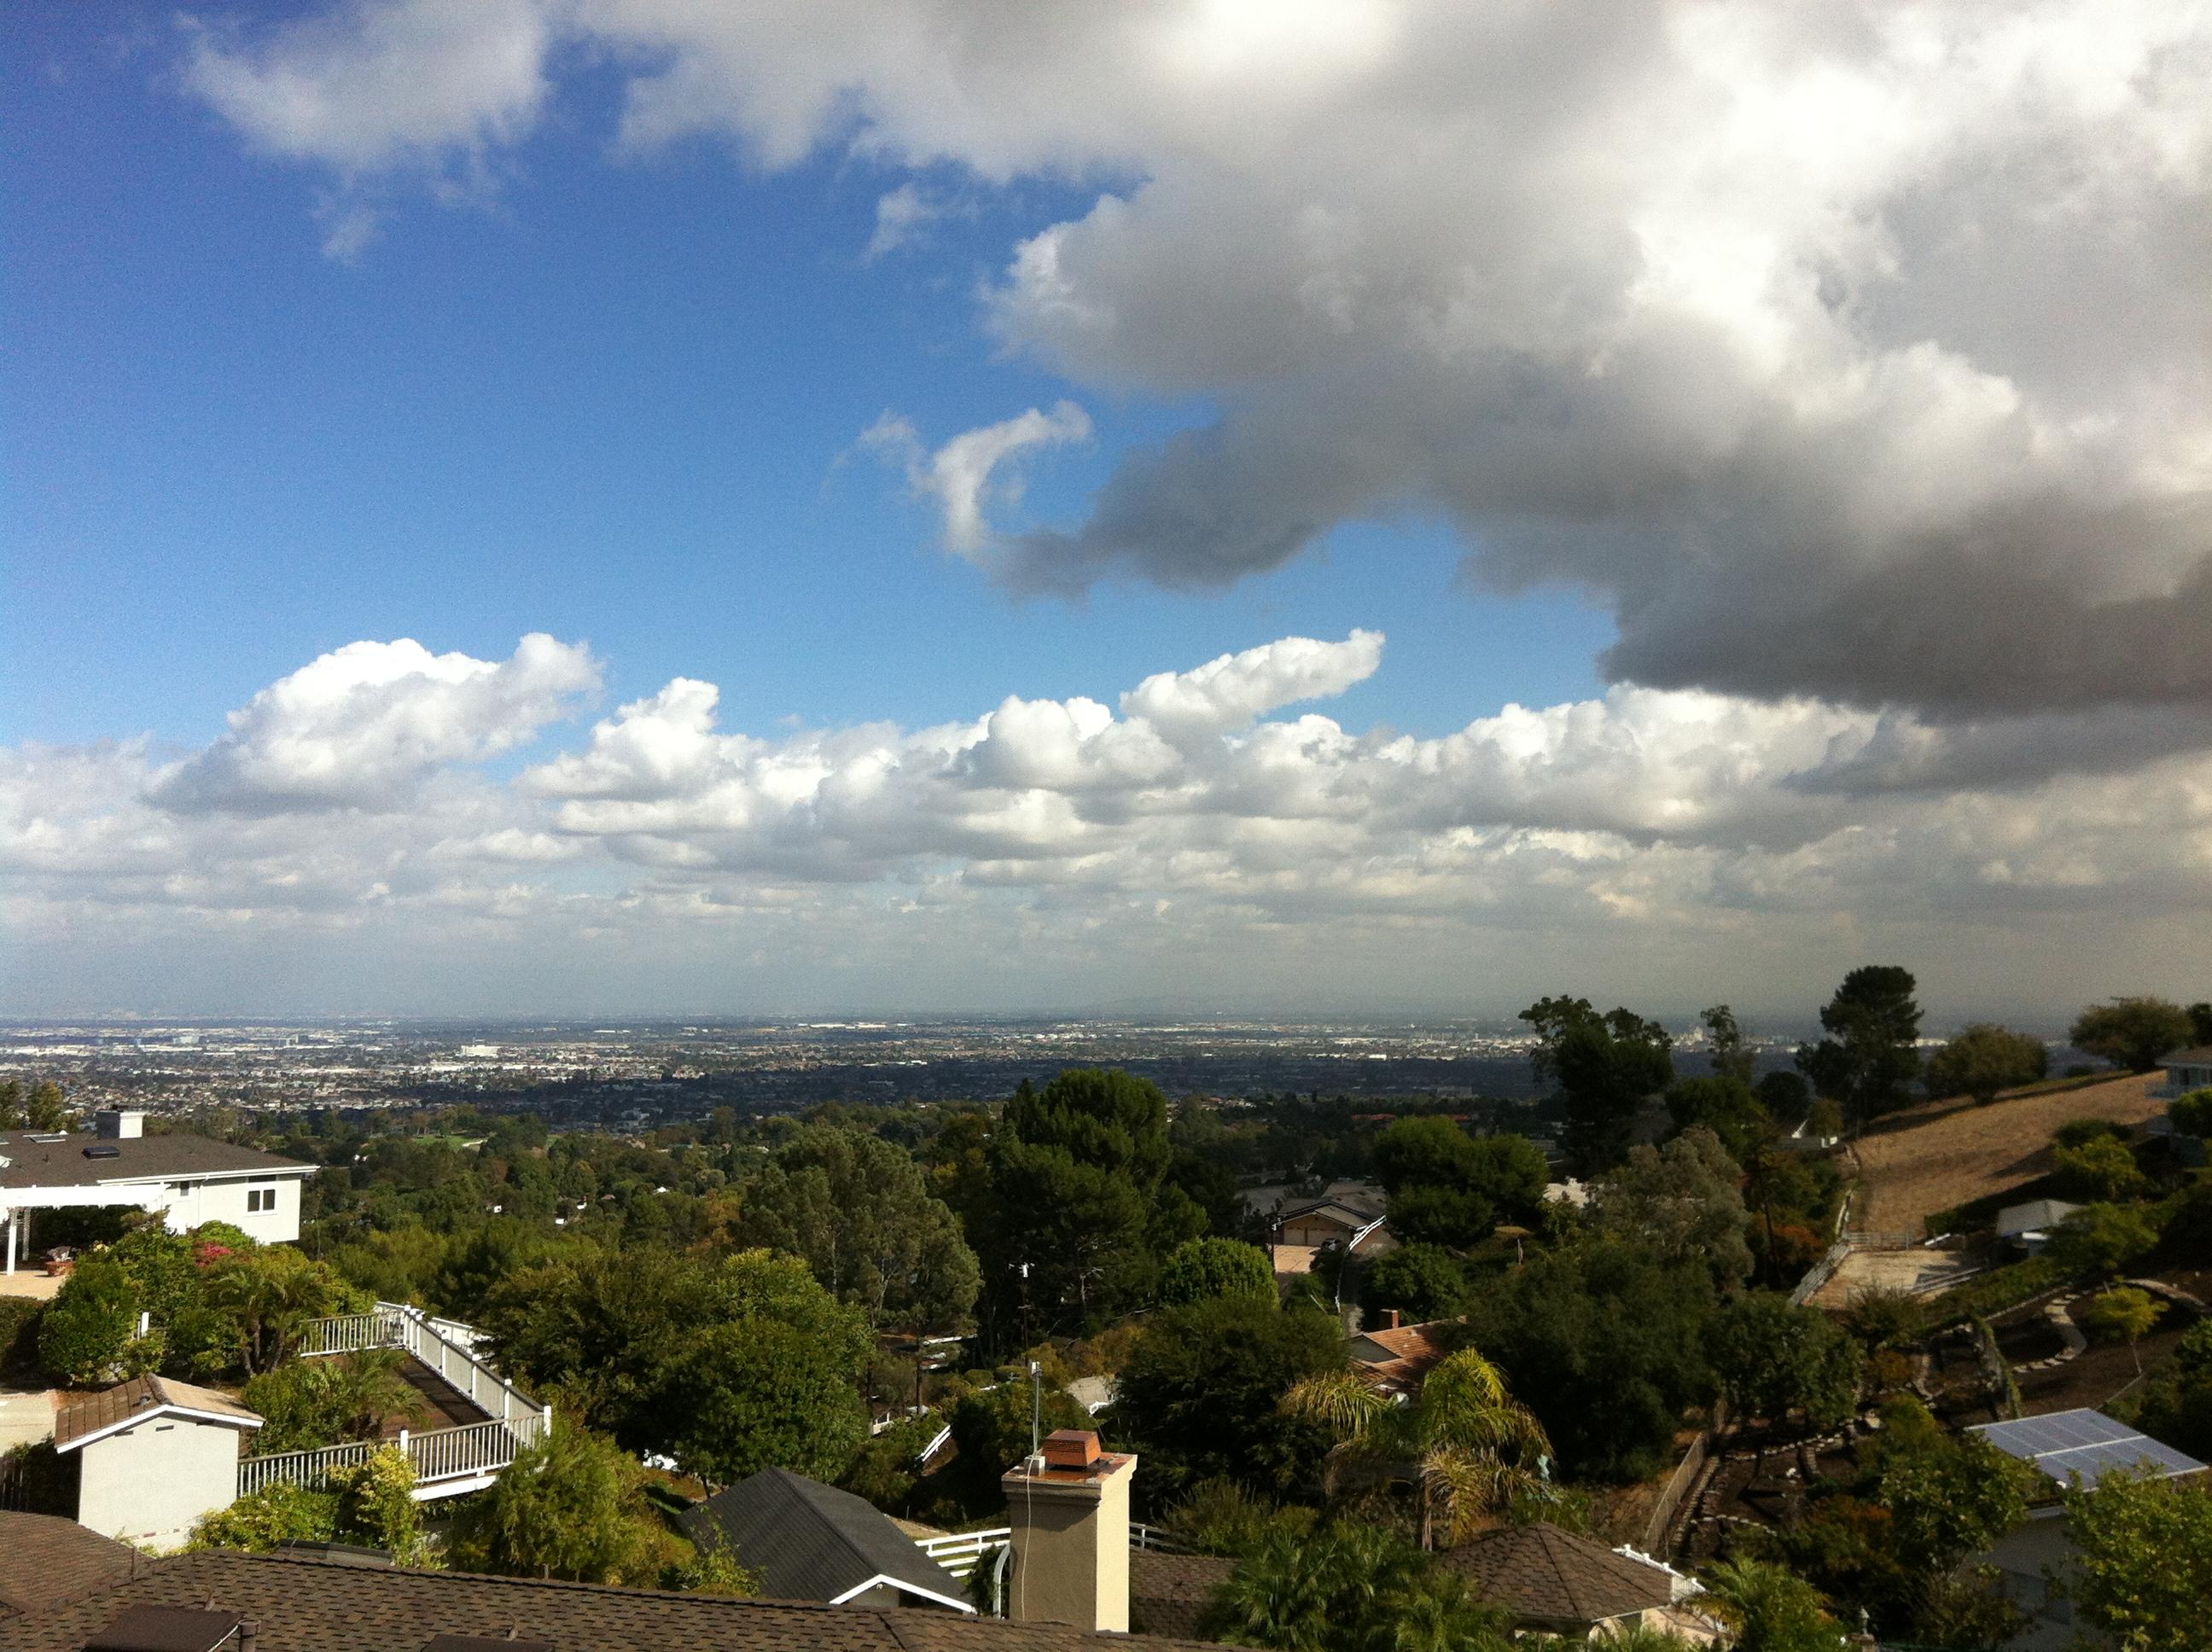 The eastside of Palos Verdes